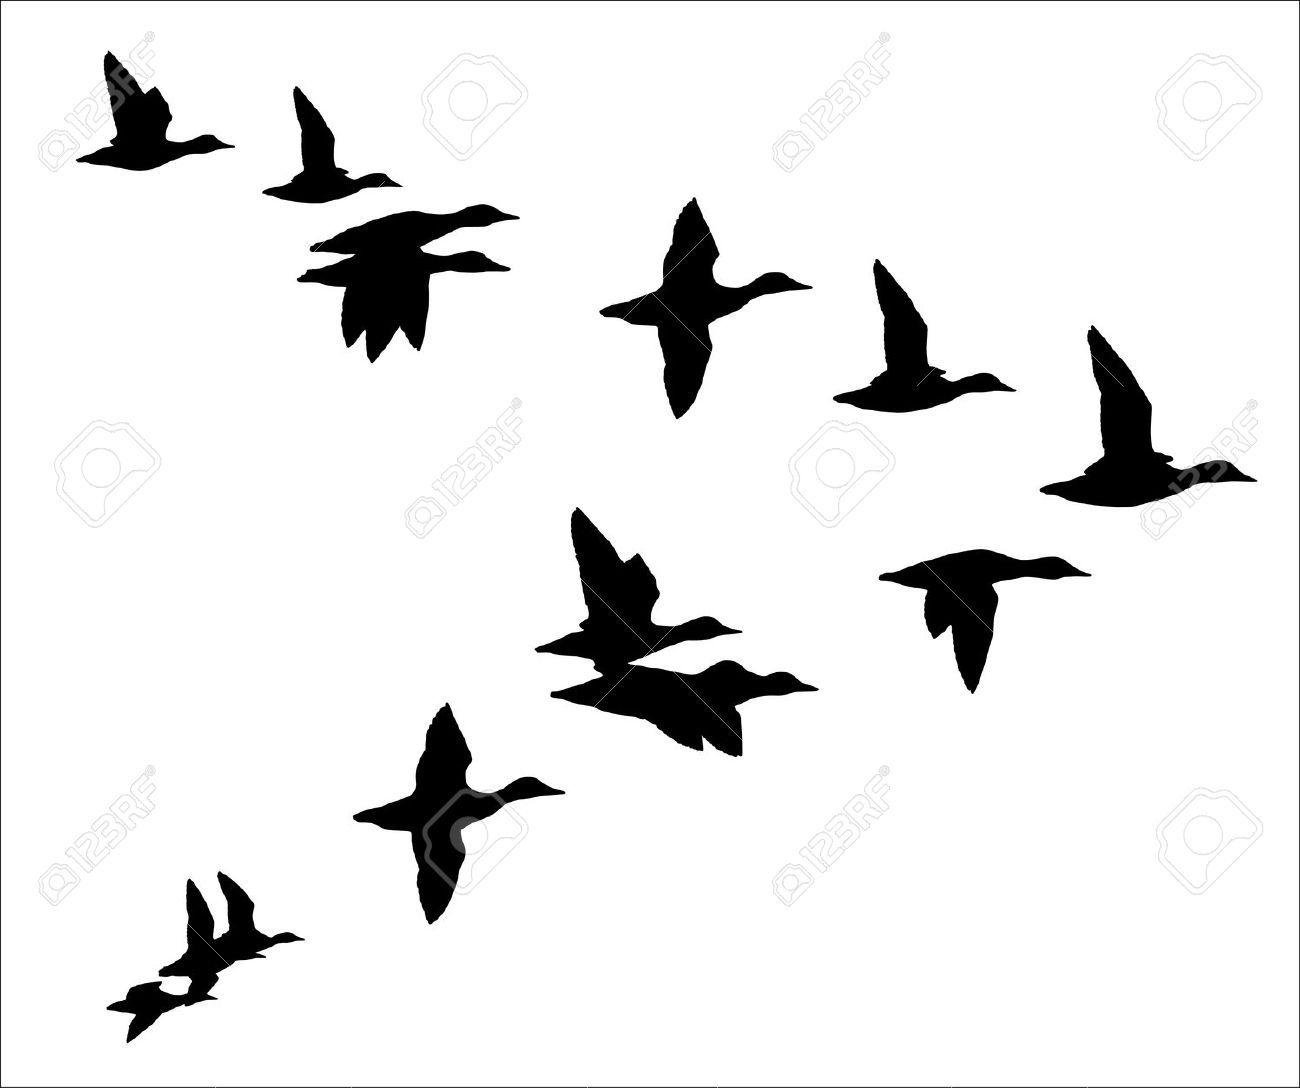 Goose clipart bird fly #3.